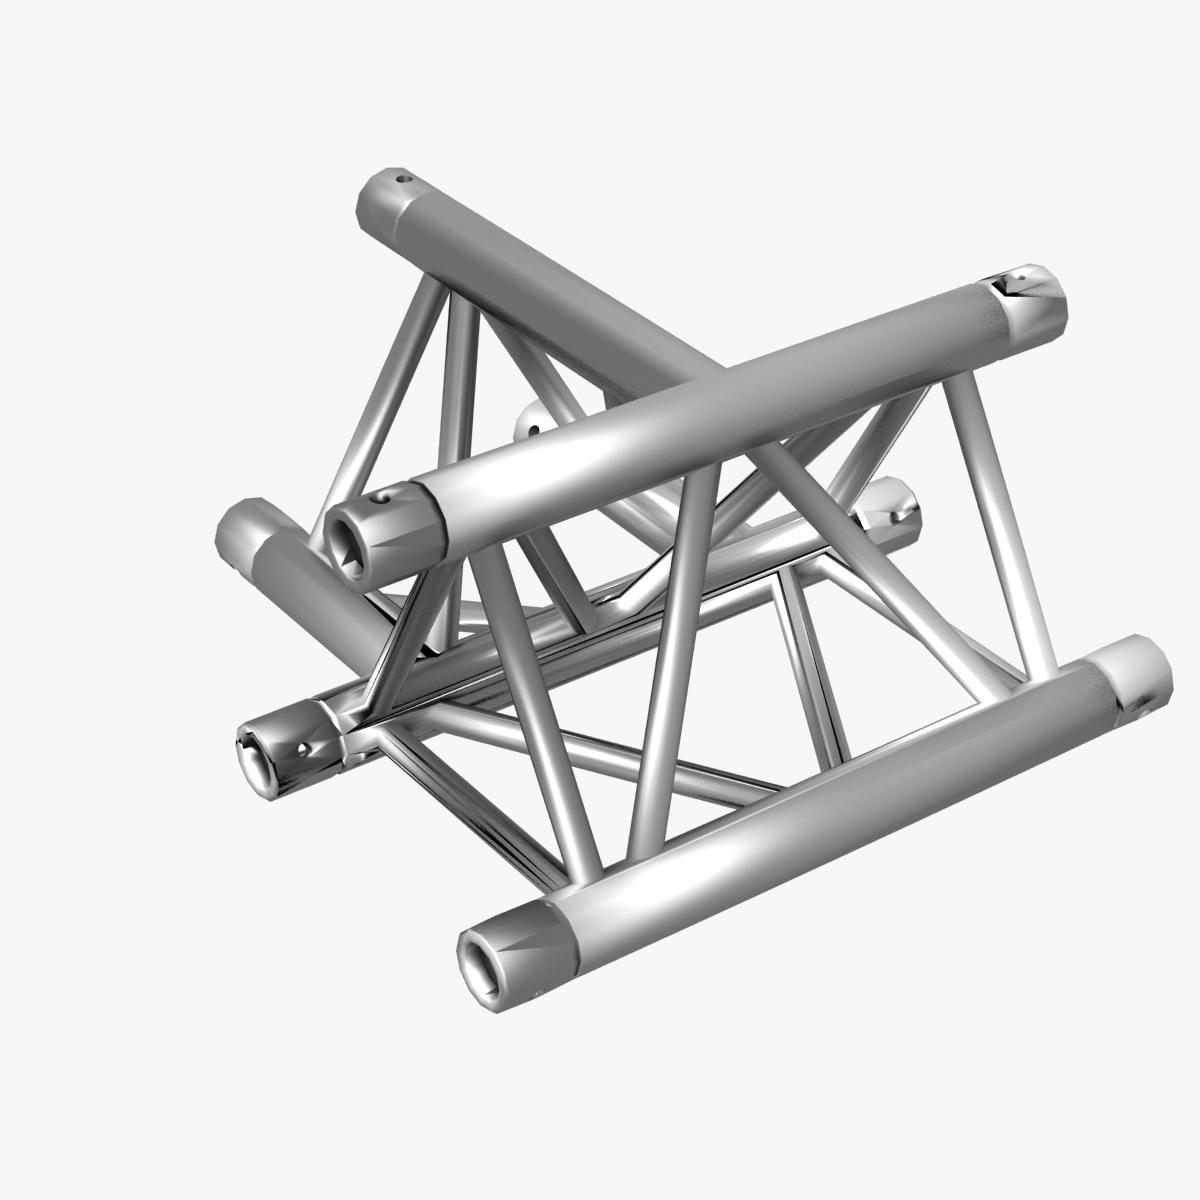 Triangular Truss Cross T Junction 84 3d model 3ds max dxf fbx b3d c4d  obj 268958